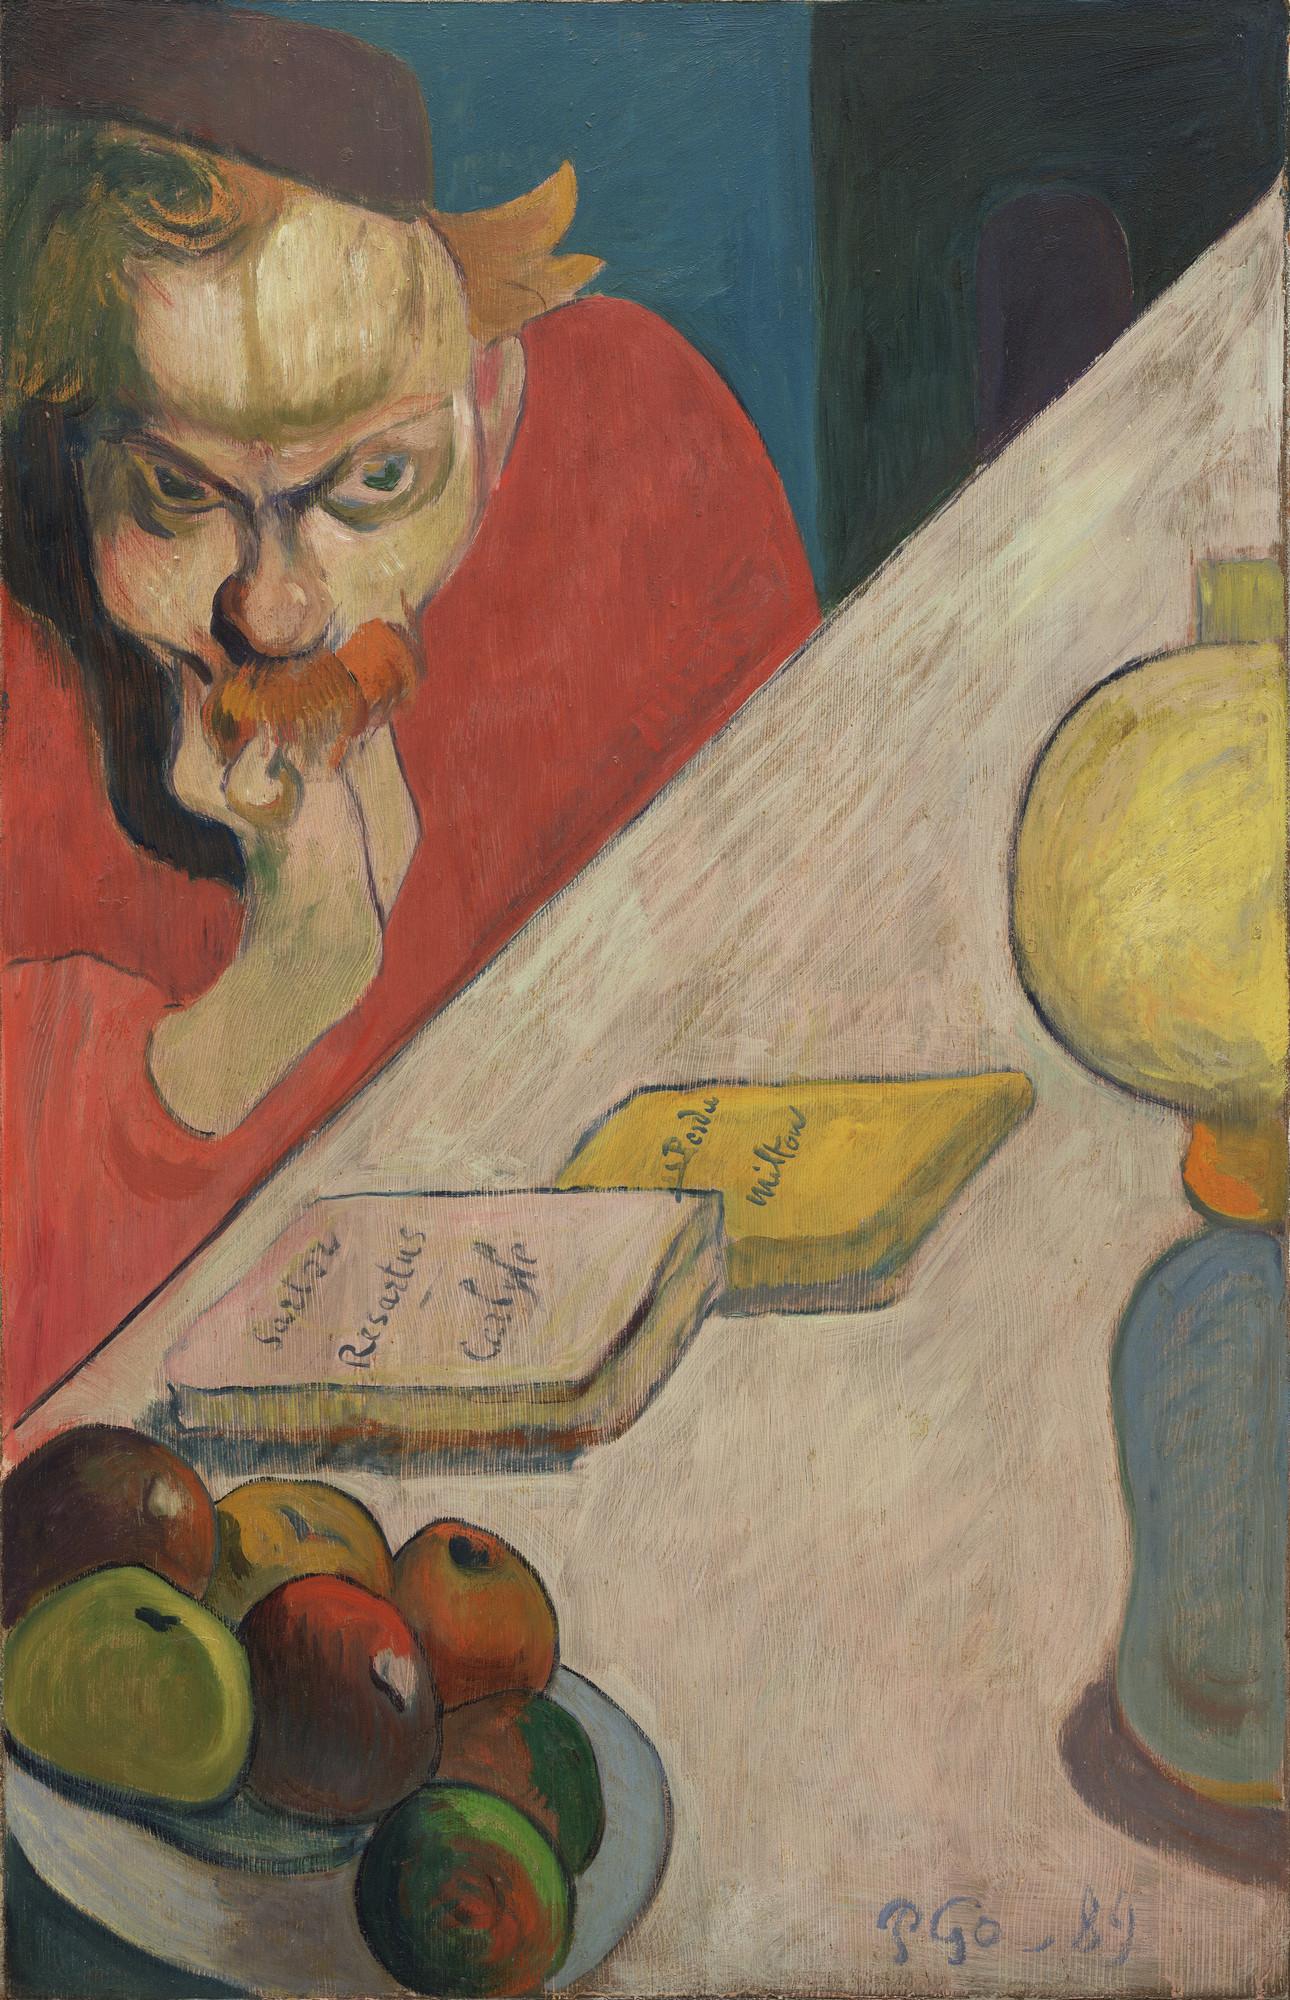 Symbolism moma paul gauguin portrait of jacob meyer de haan 1889 biocorpaavc Images